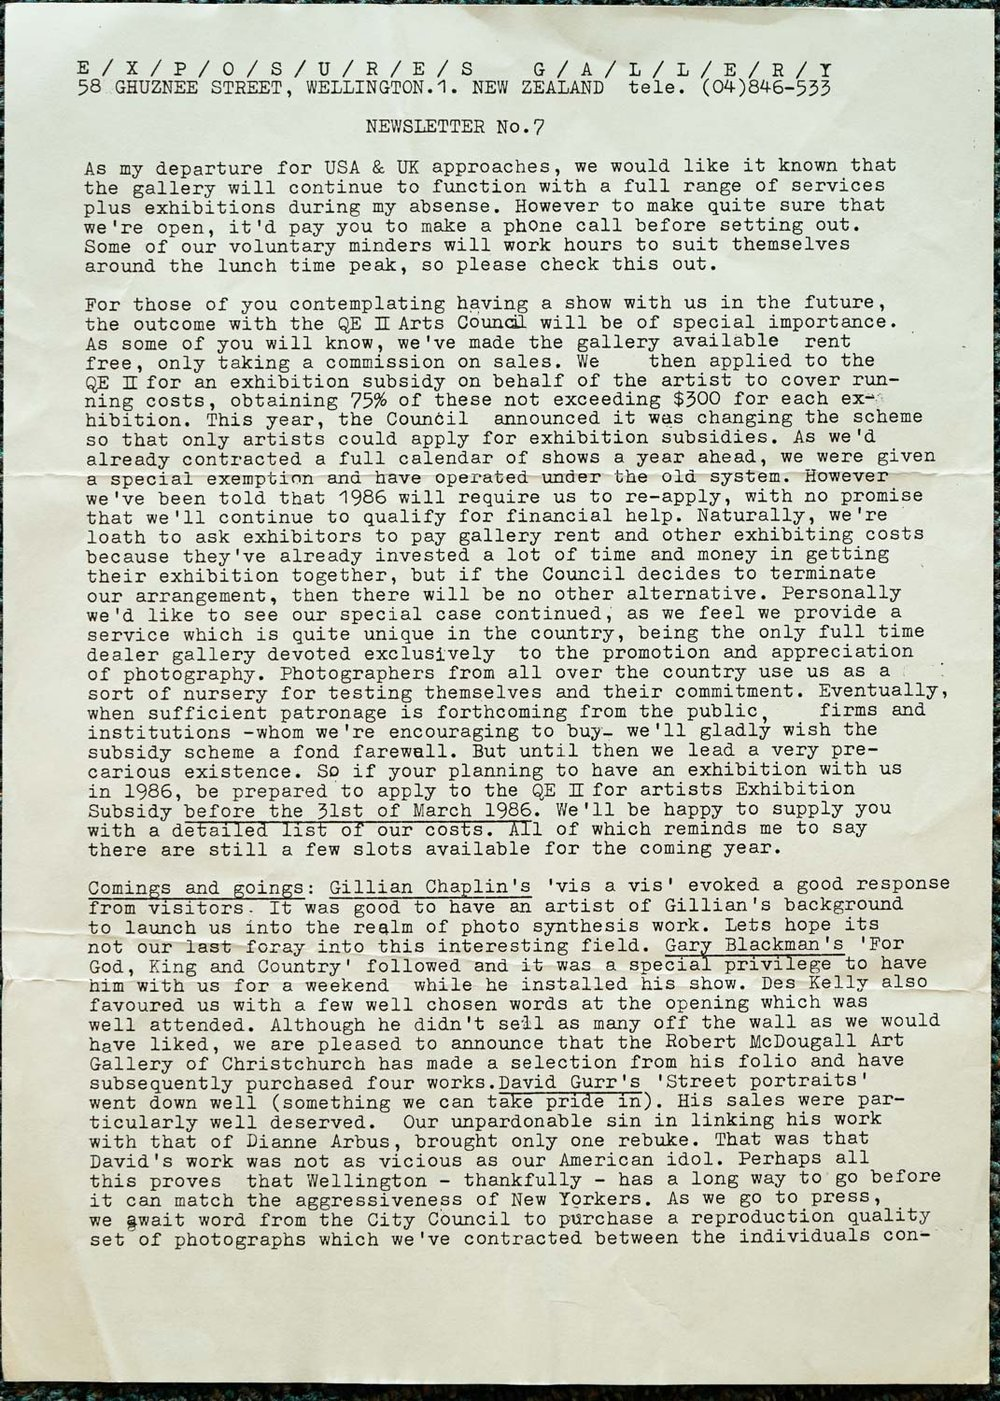 Exposures  Gallery Newsletter No.7, August 1985